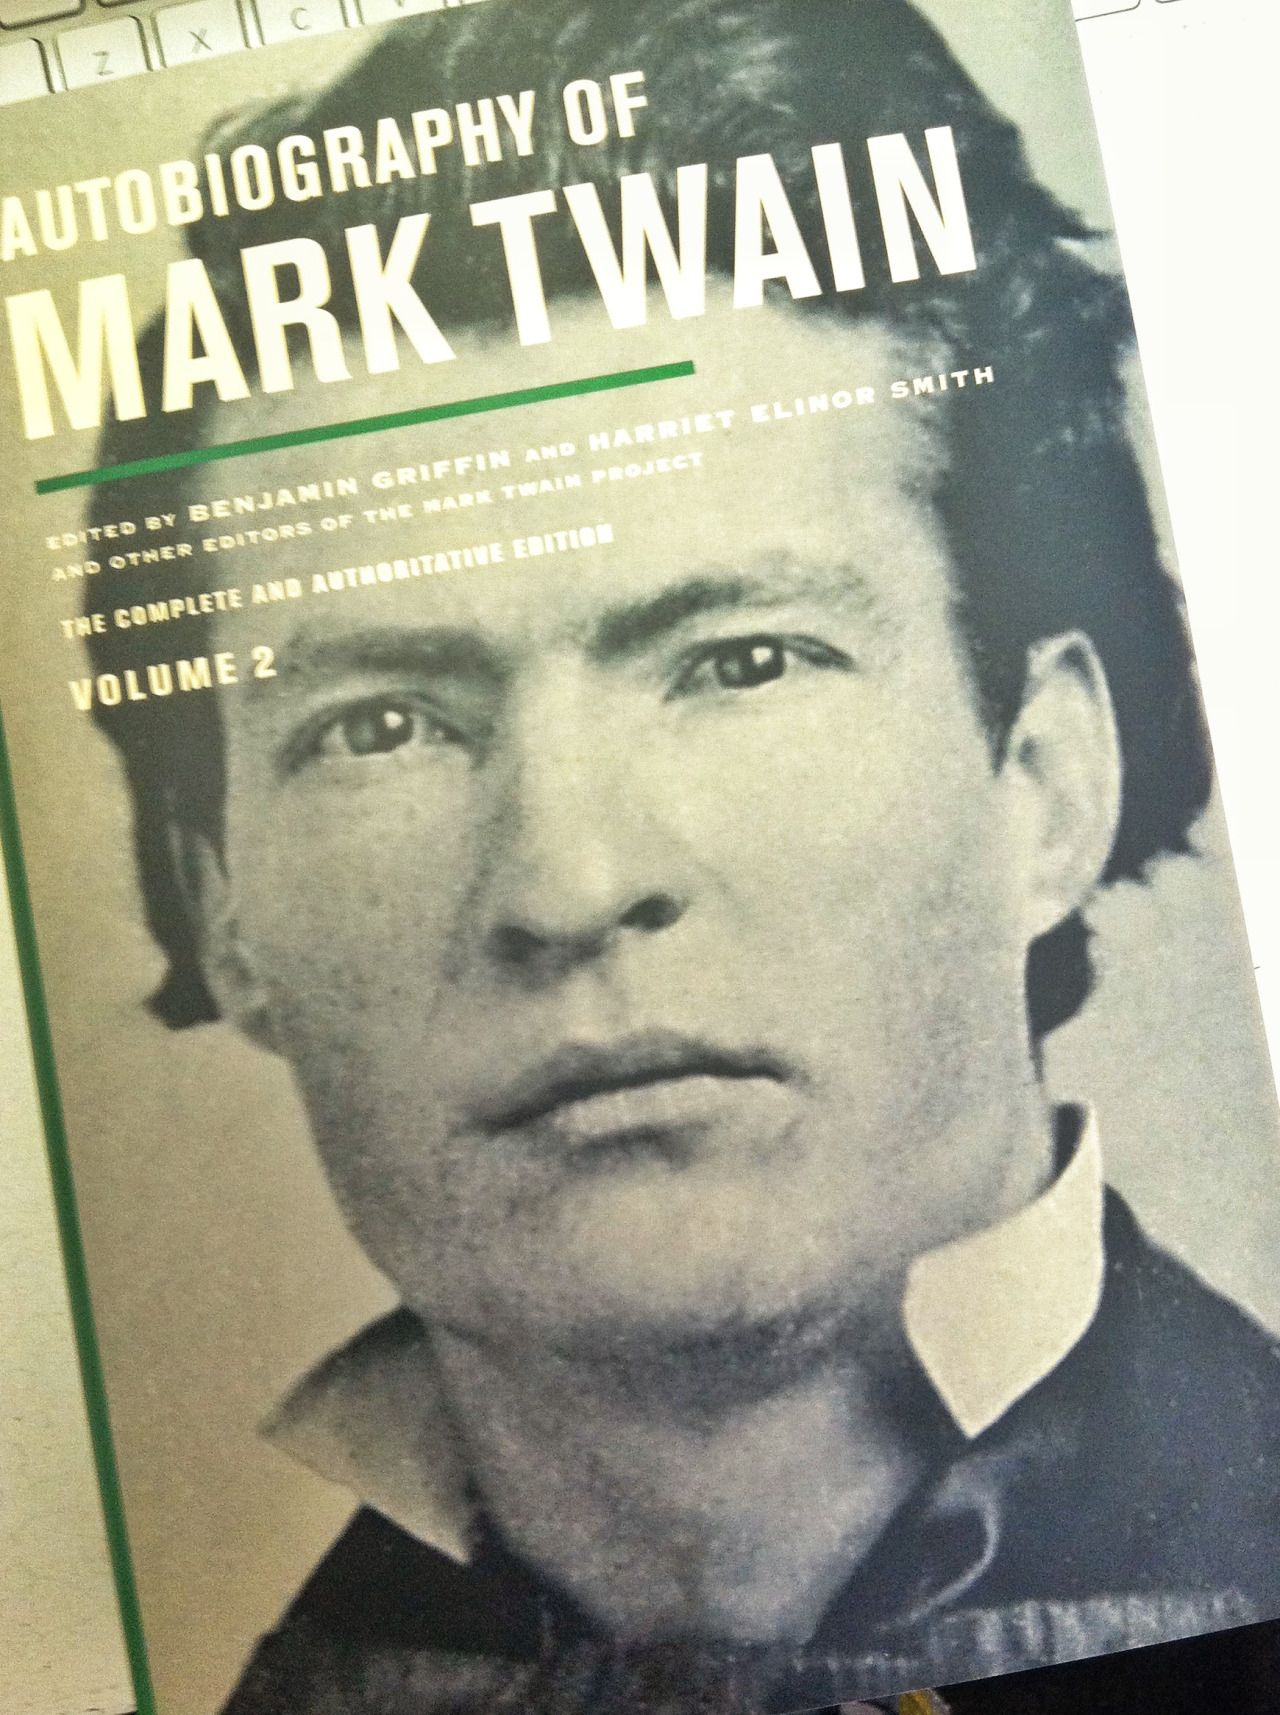 The teen-aged Mark Twain!Samuel Clemens, aka Mark Twain c. 1851, when he was 16 years old.